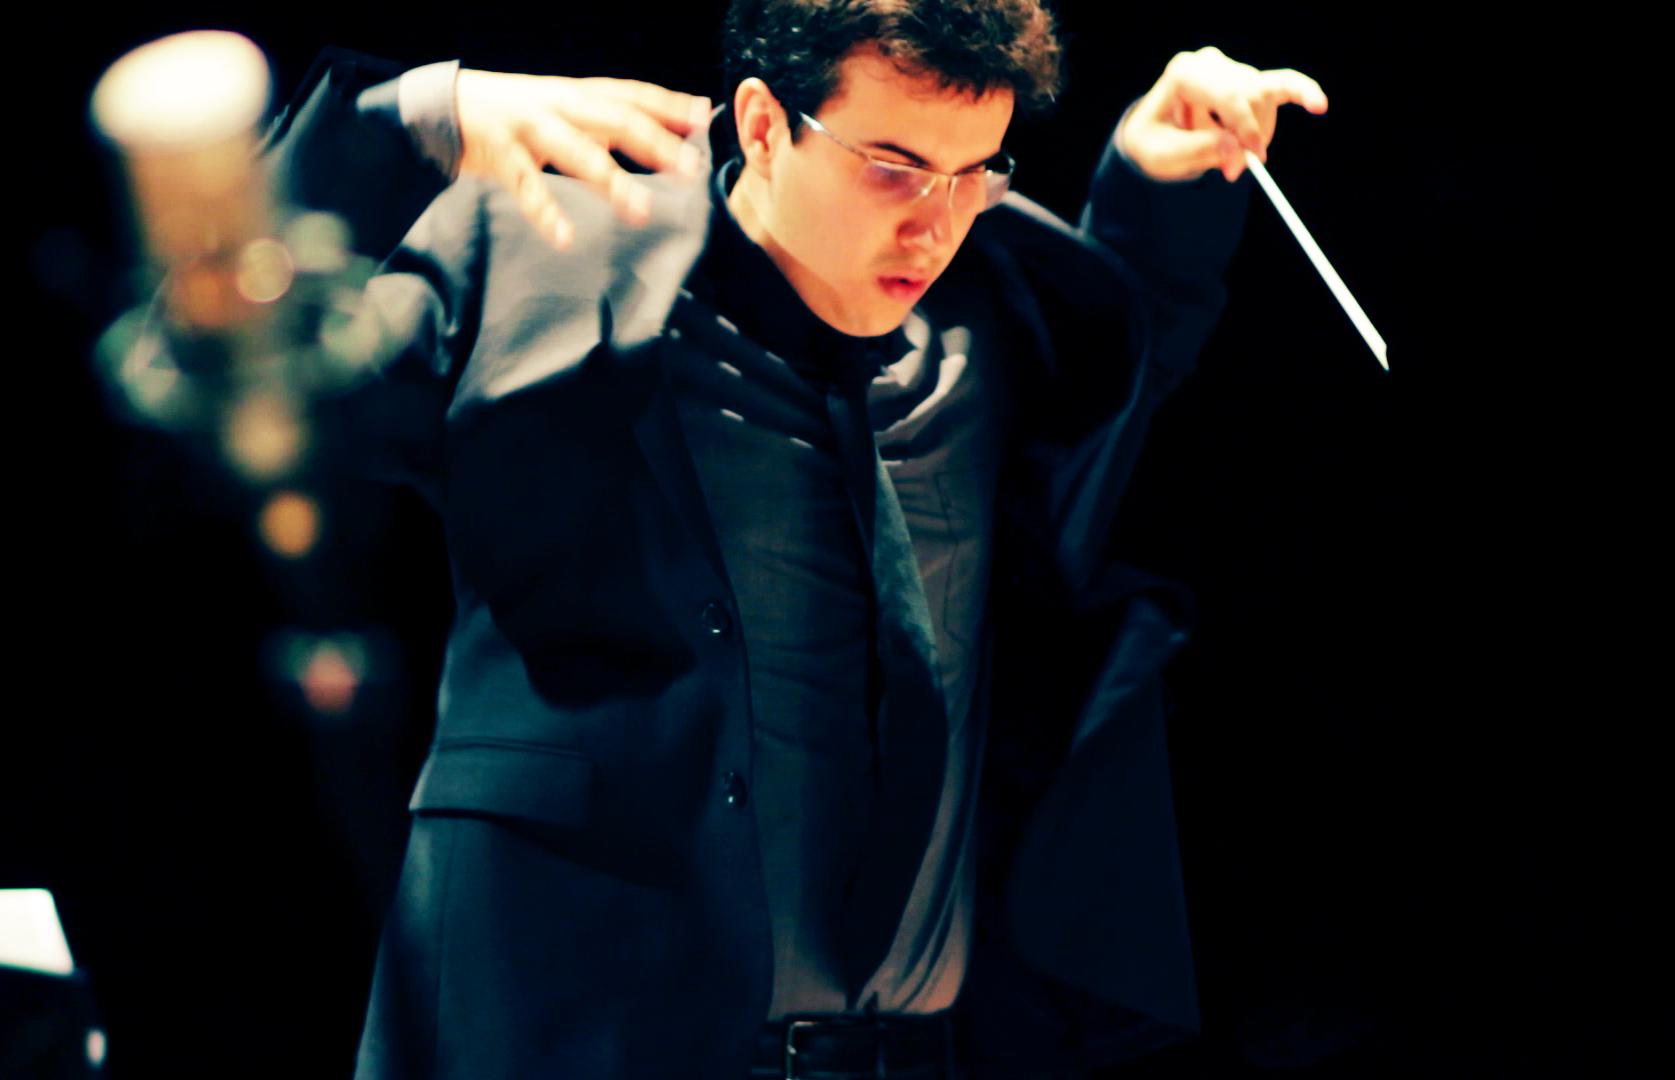 Rafael Piccolotto de Lima conducting UNICAMP Symphonic Orchestra at Teatro Castro Mendes, Campinas - Brazil. Jazz Symphonic concert featuring Rafael's music.